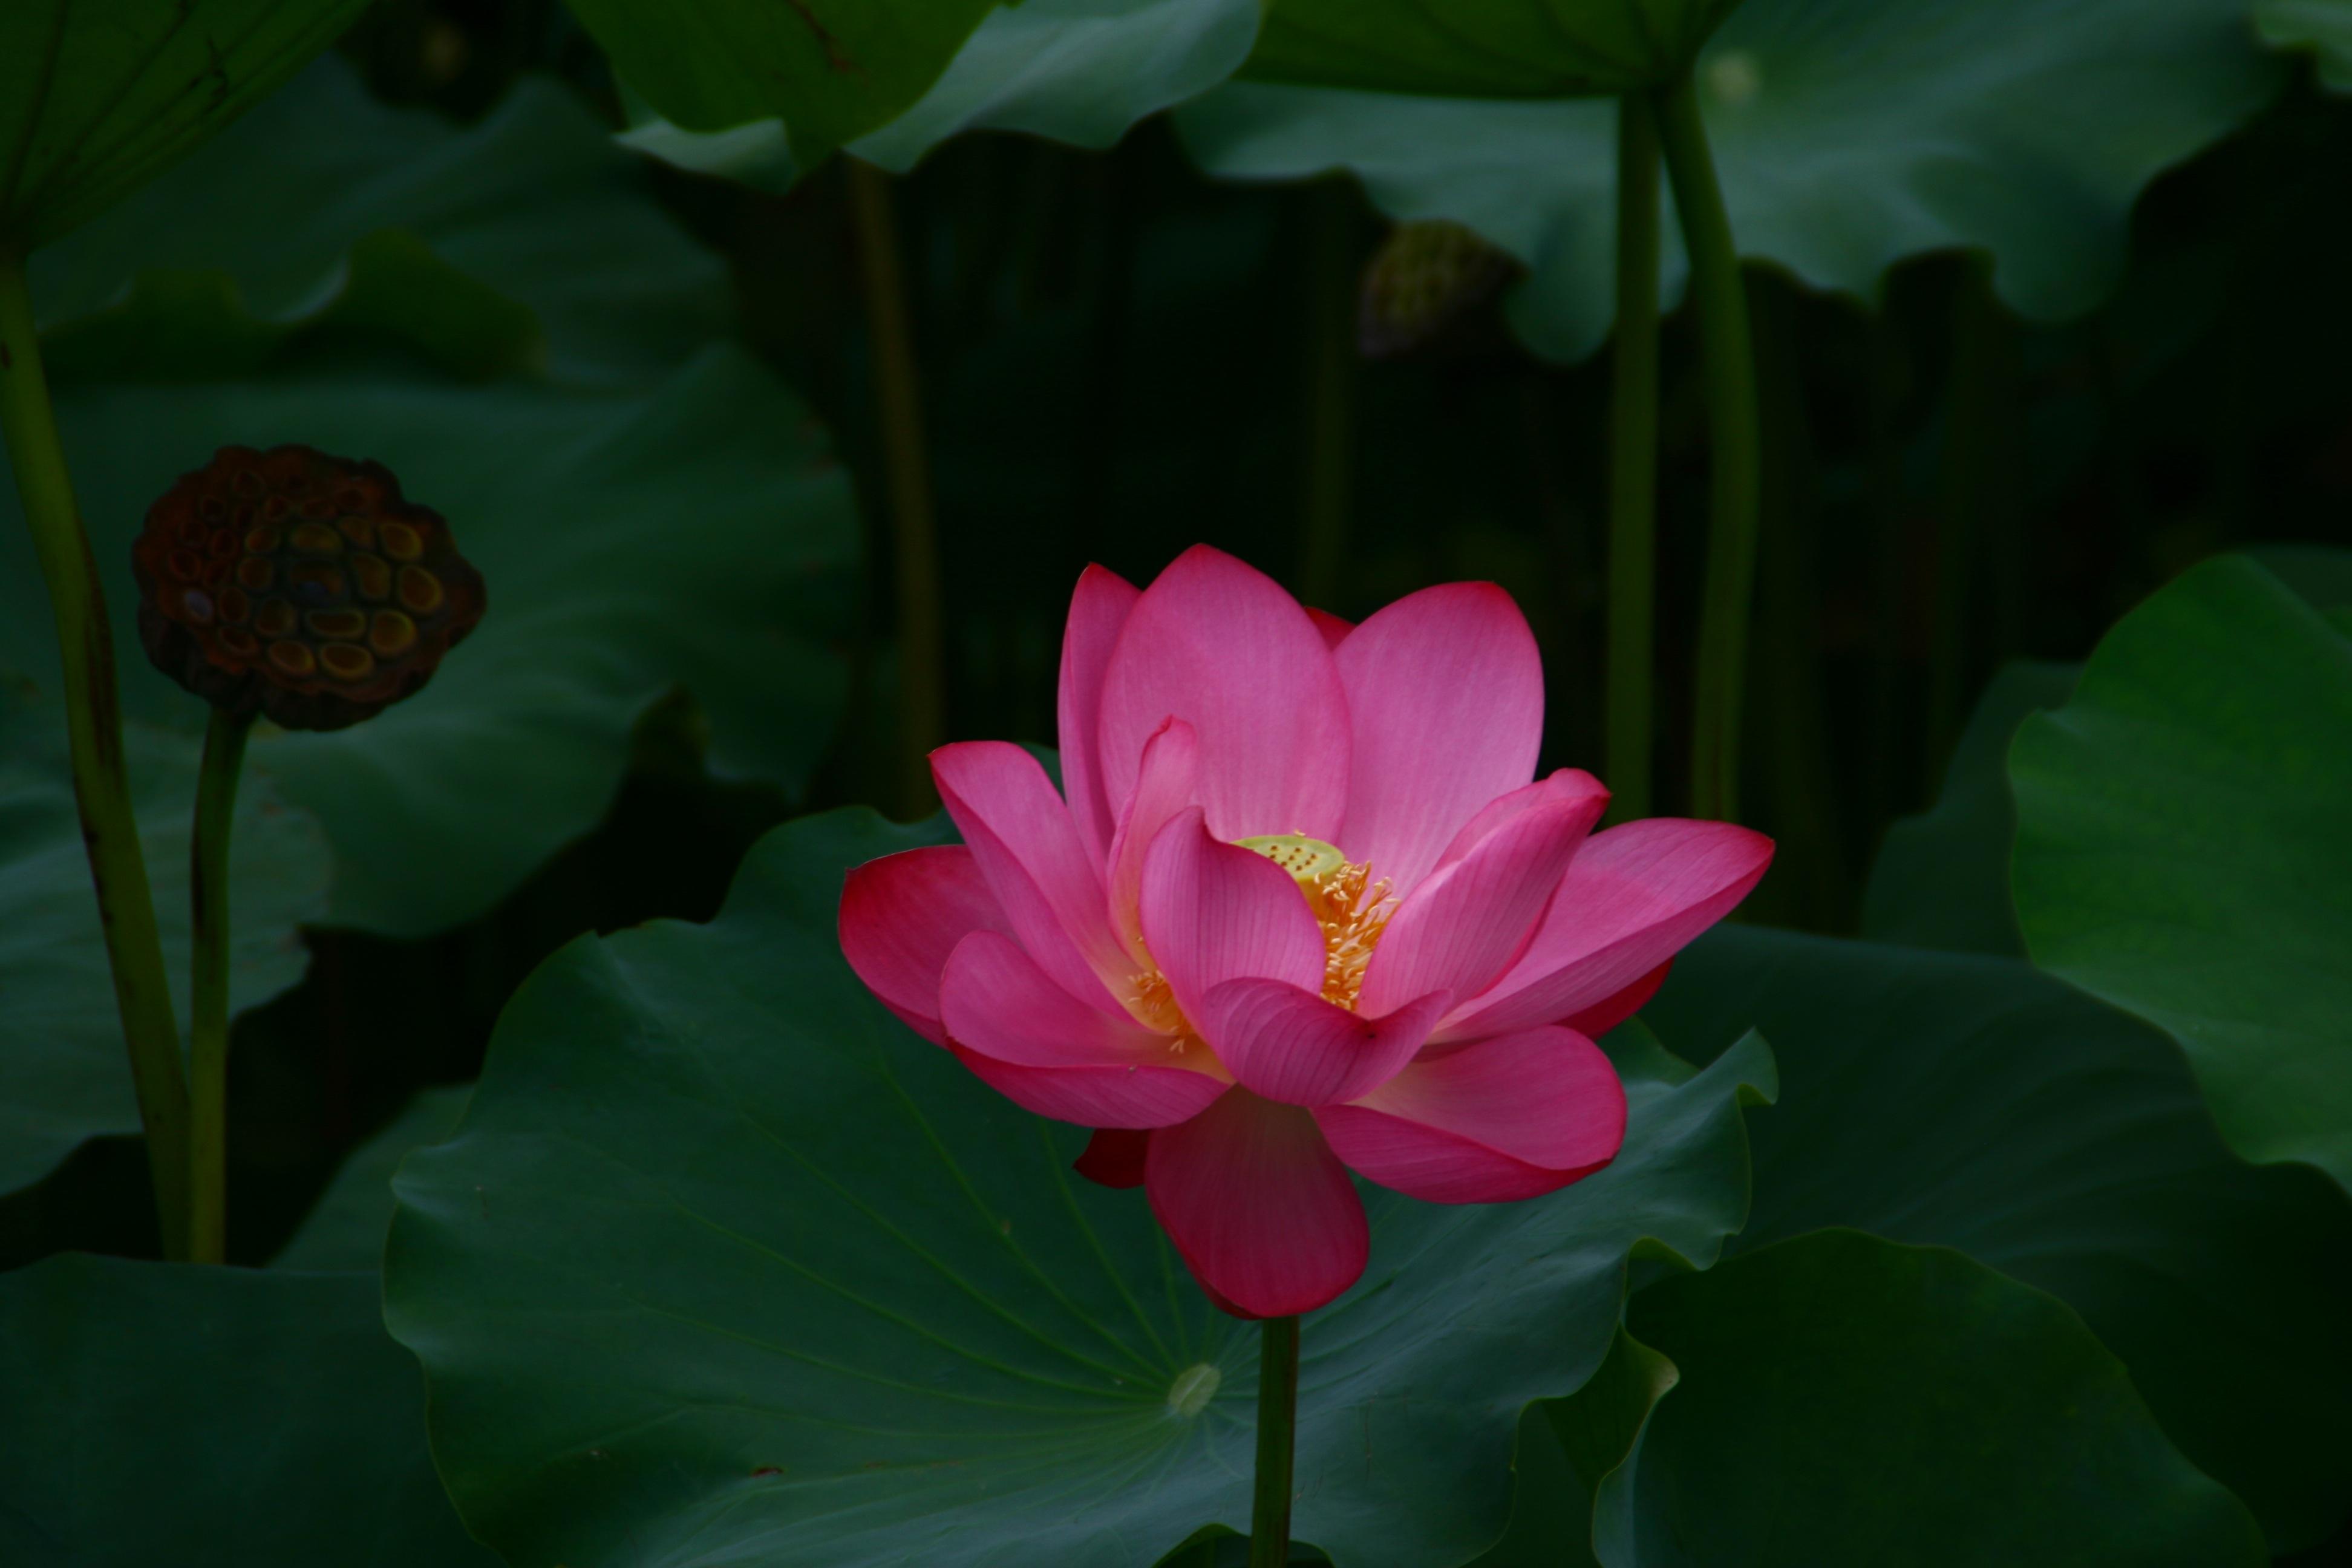 Fotos Gratis Flor Pétalo Budismo Botánica Loto Sagrado Planta